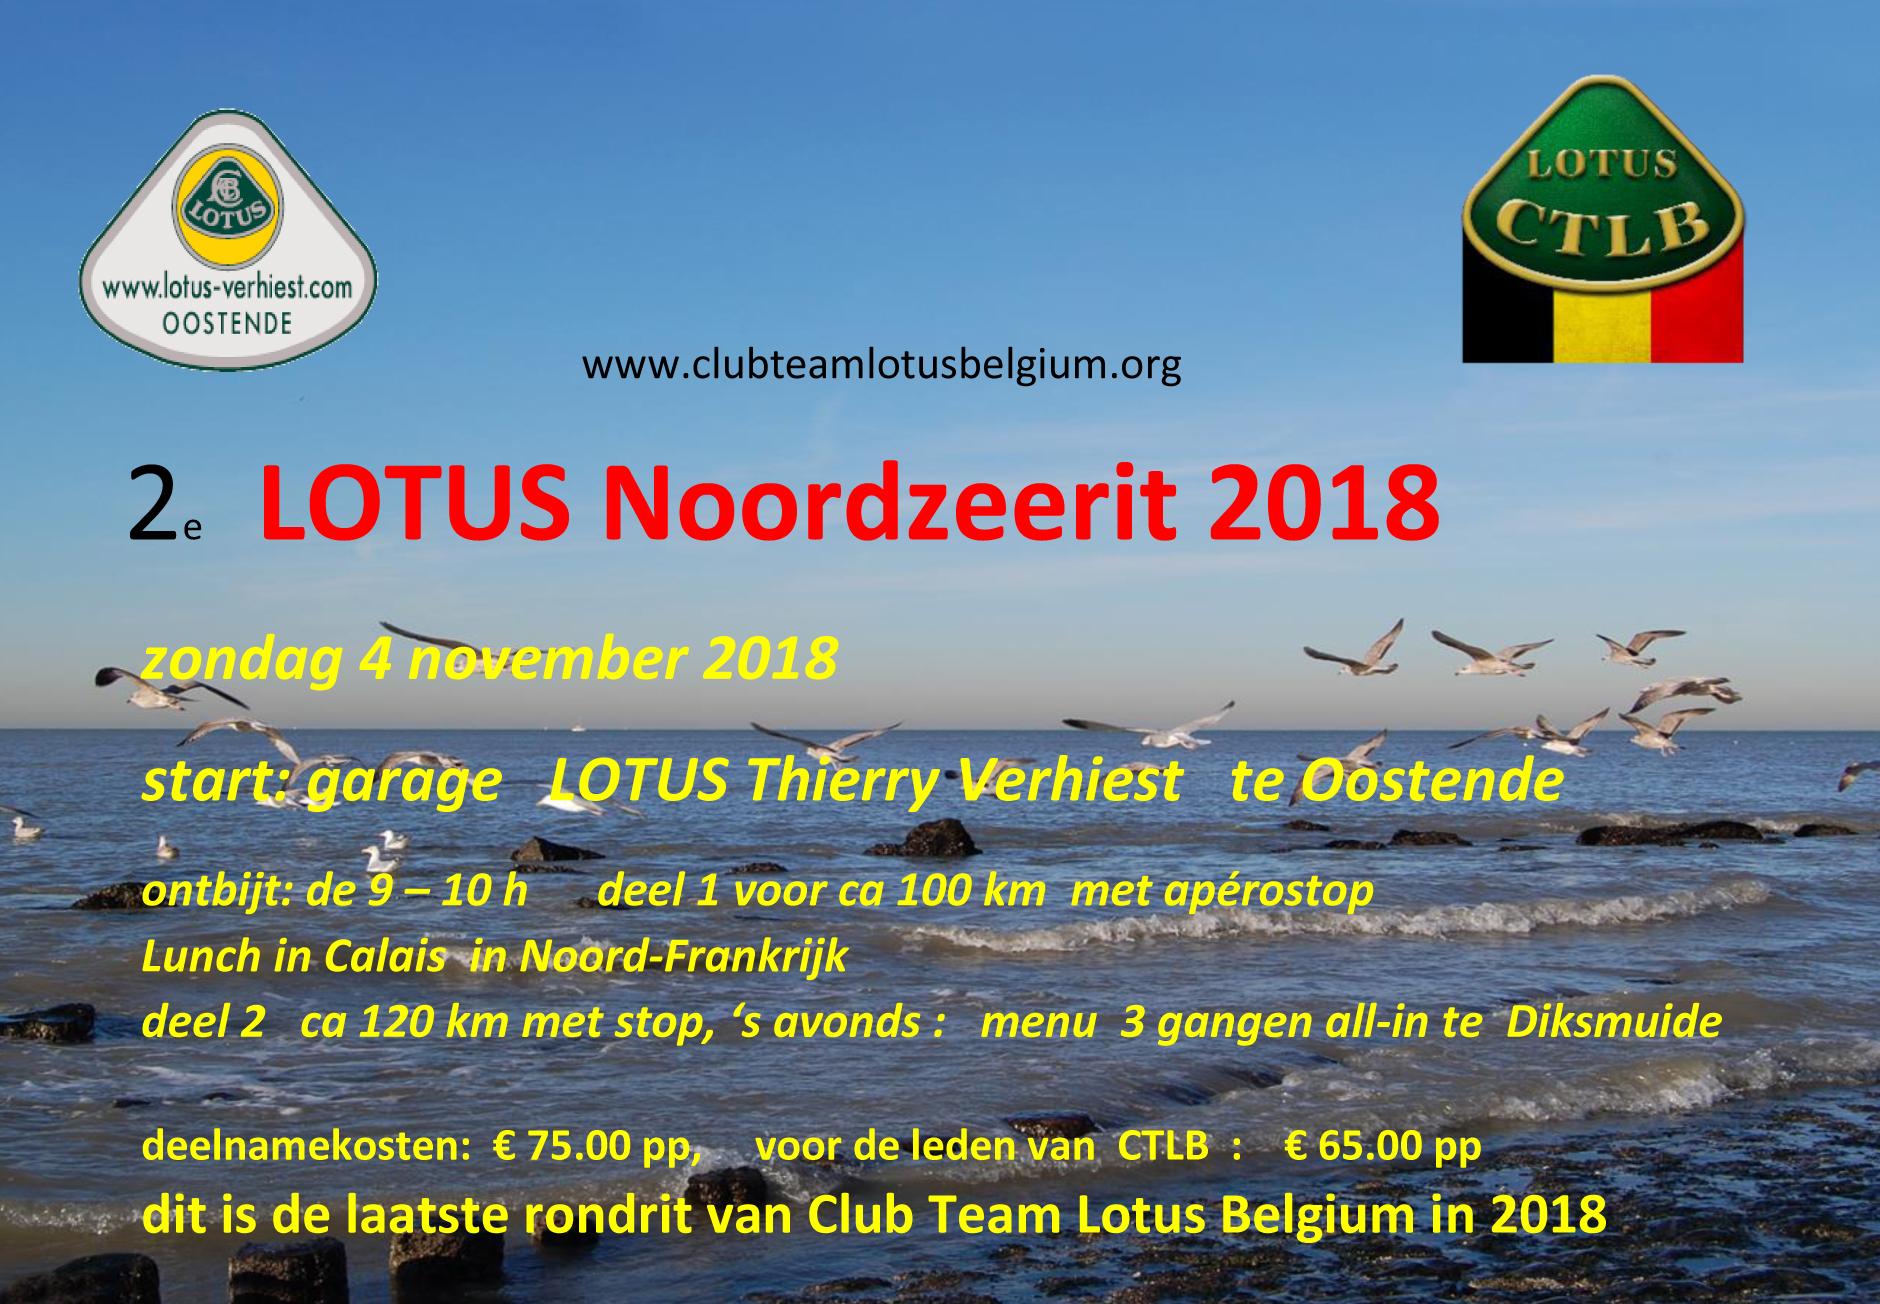 Lotus noordzeerit 2018 nl